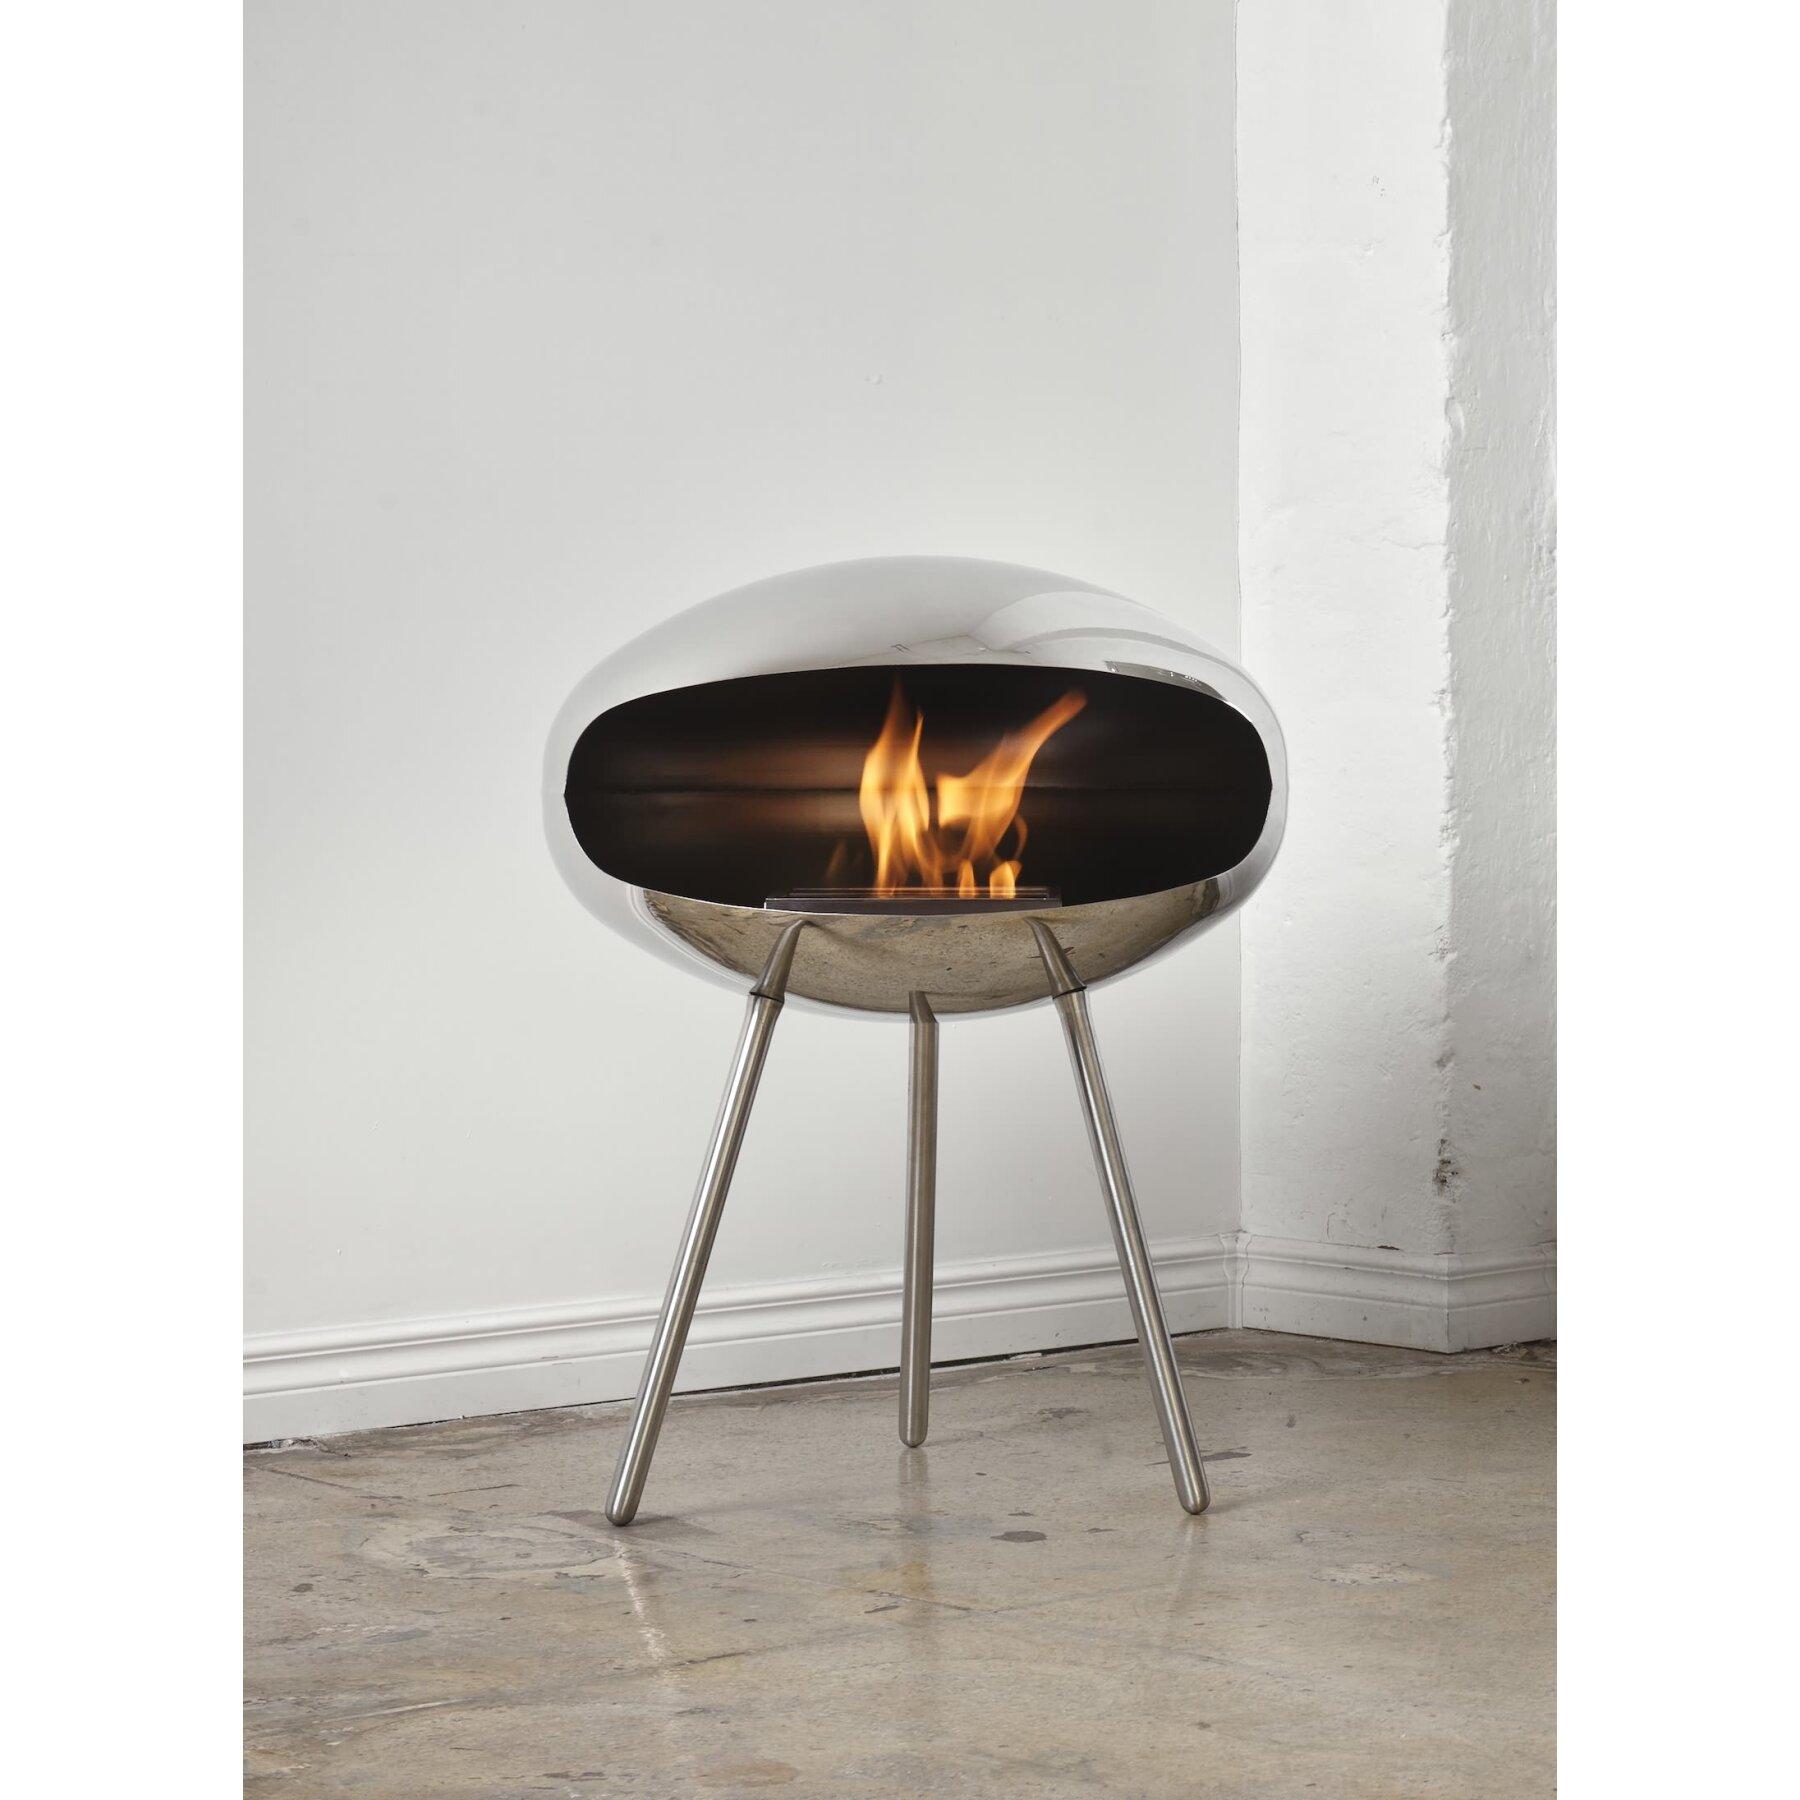 cocoon fire terra design ethanolkamin stehend. Black Bedroom Furniture Sets. Home Design Ideas